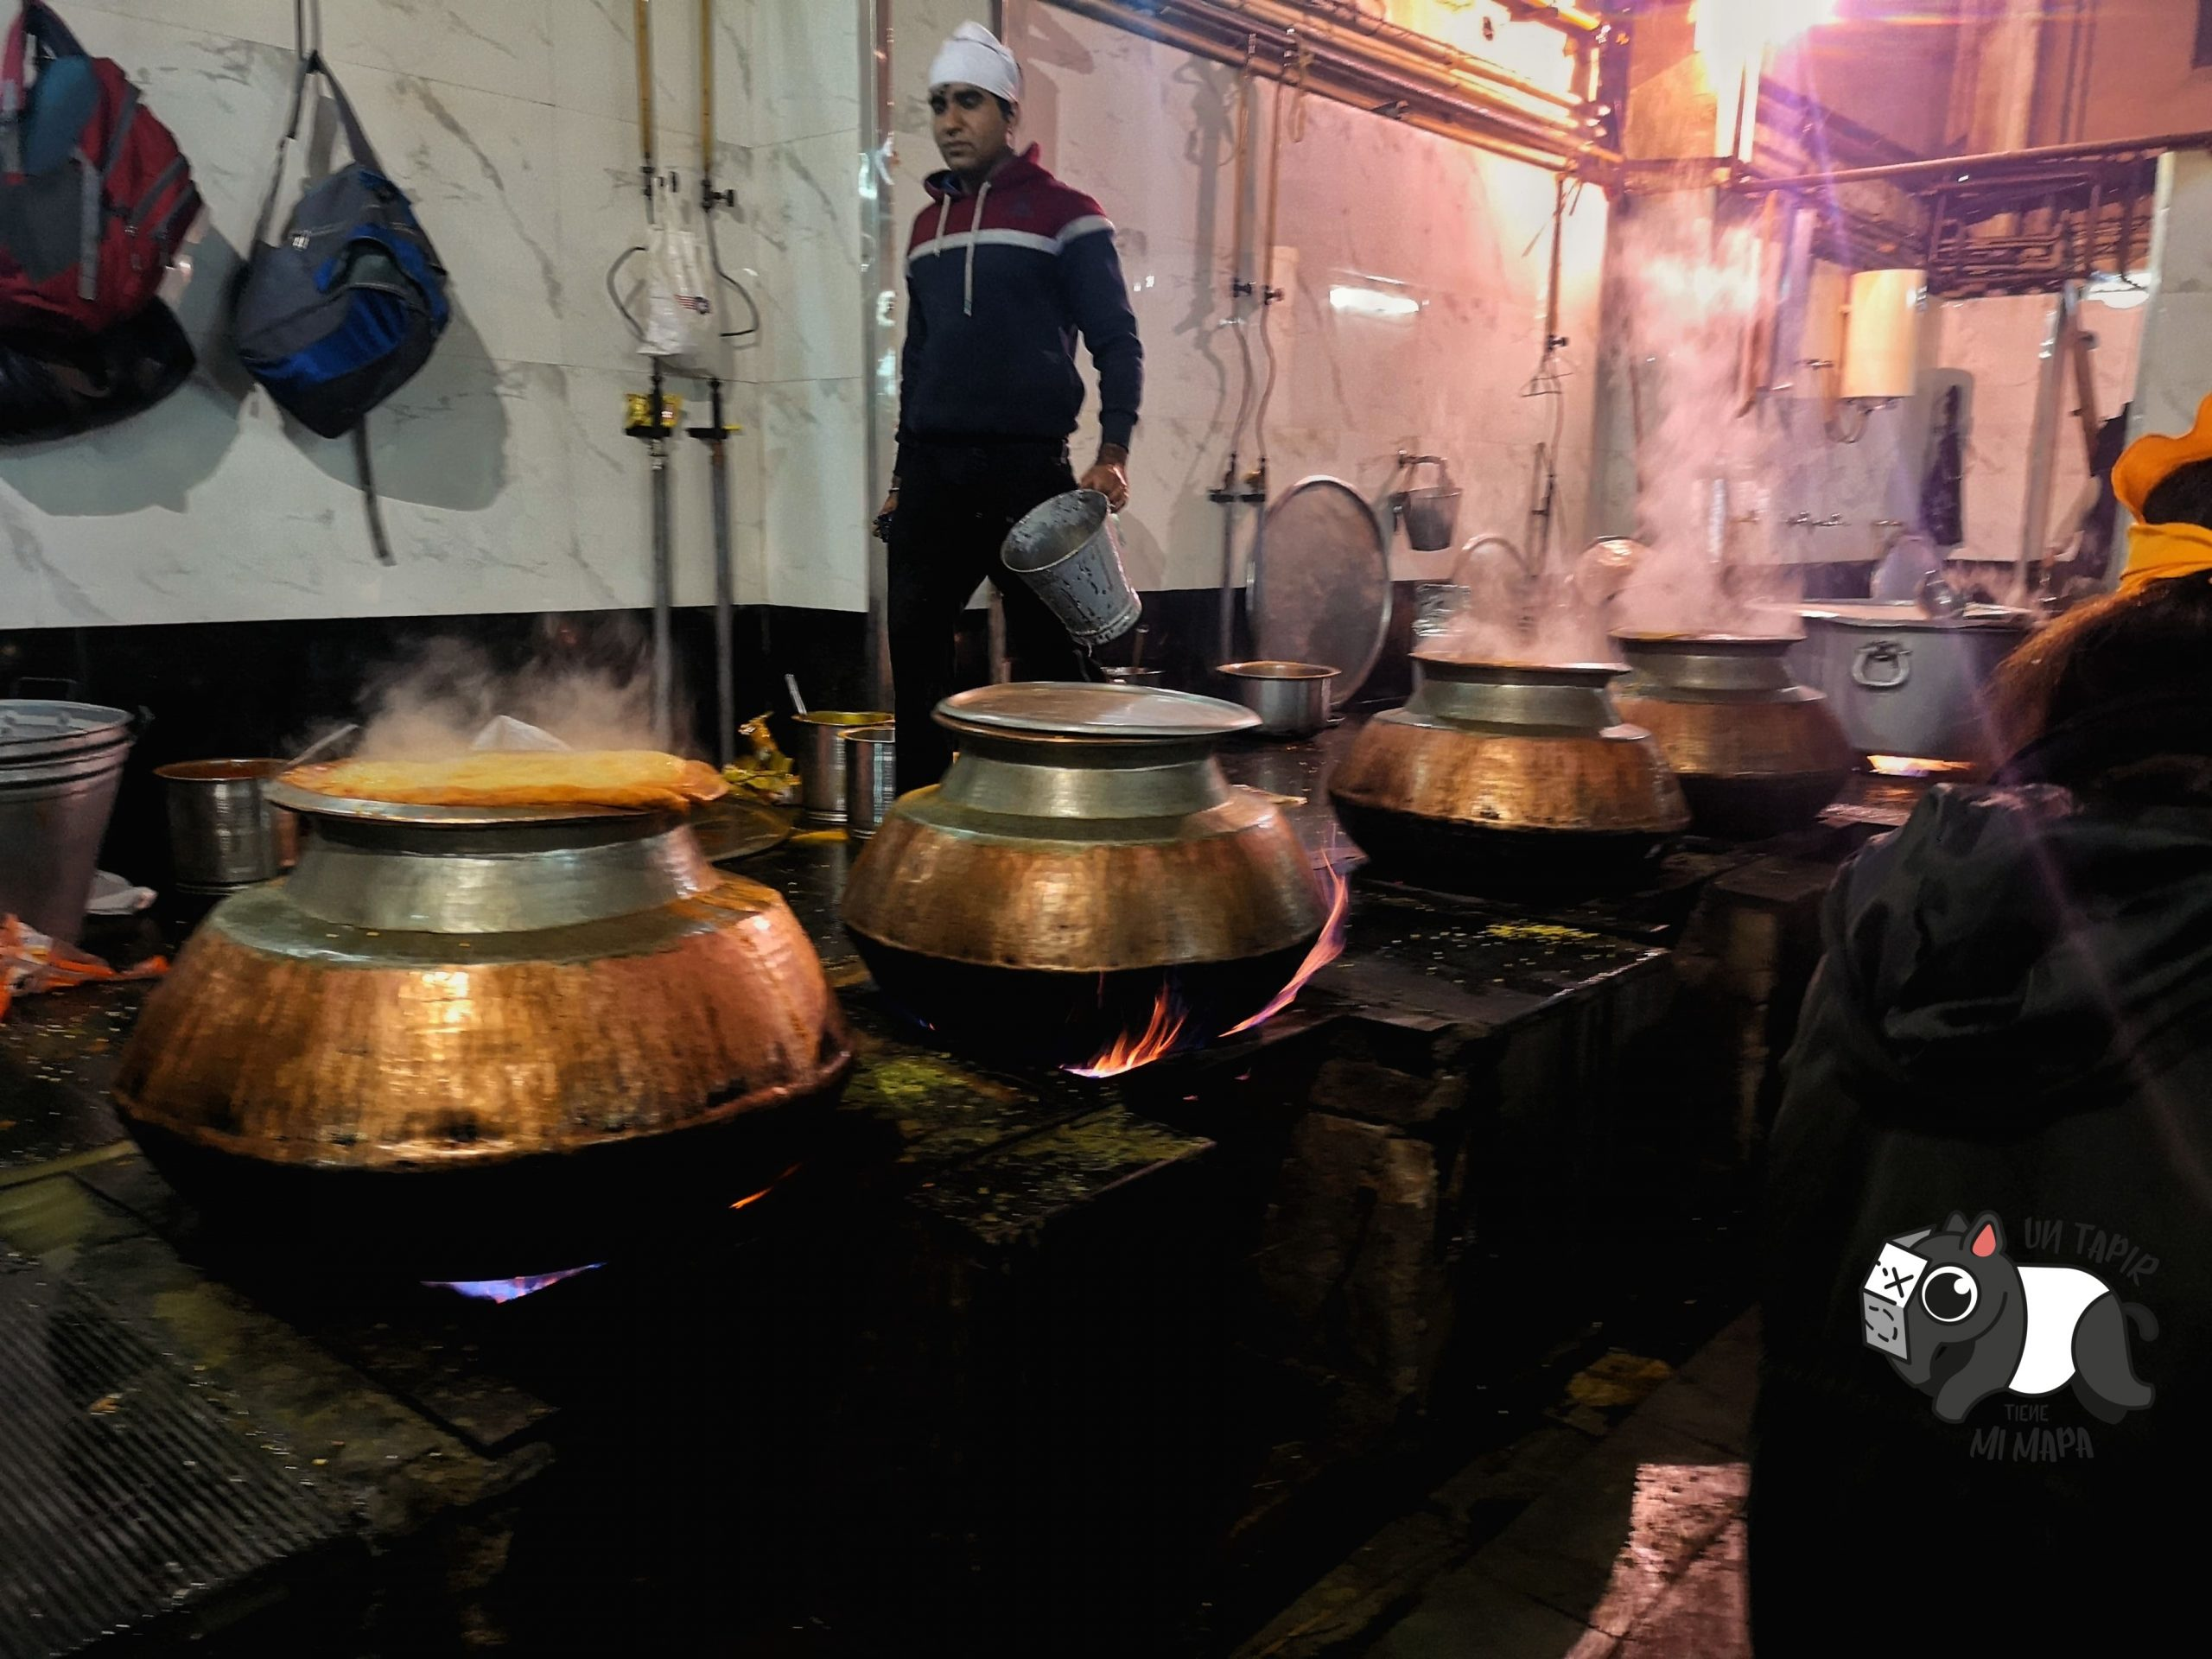 Fogones en la cocina de Gurdwara Bangla Sahib Temple